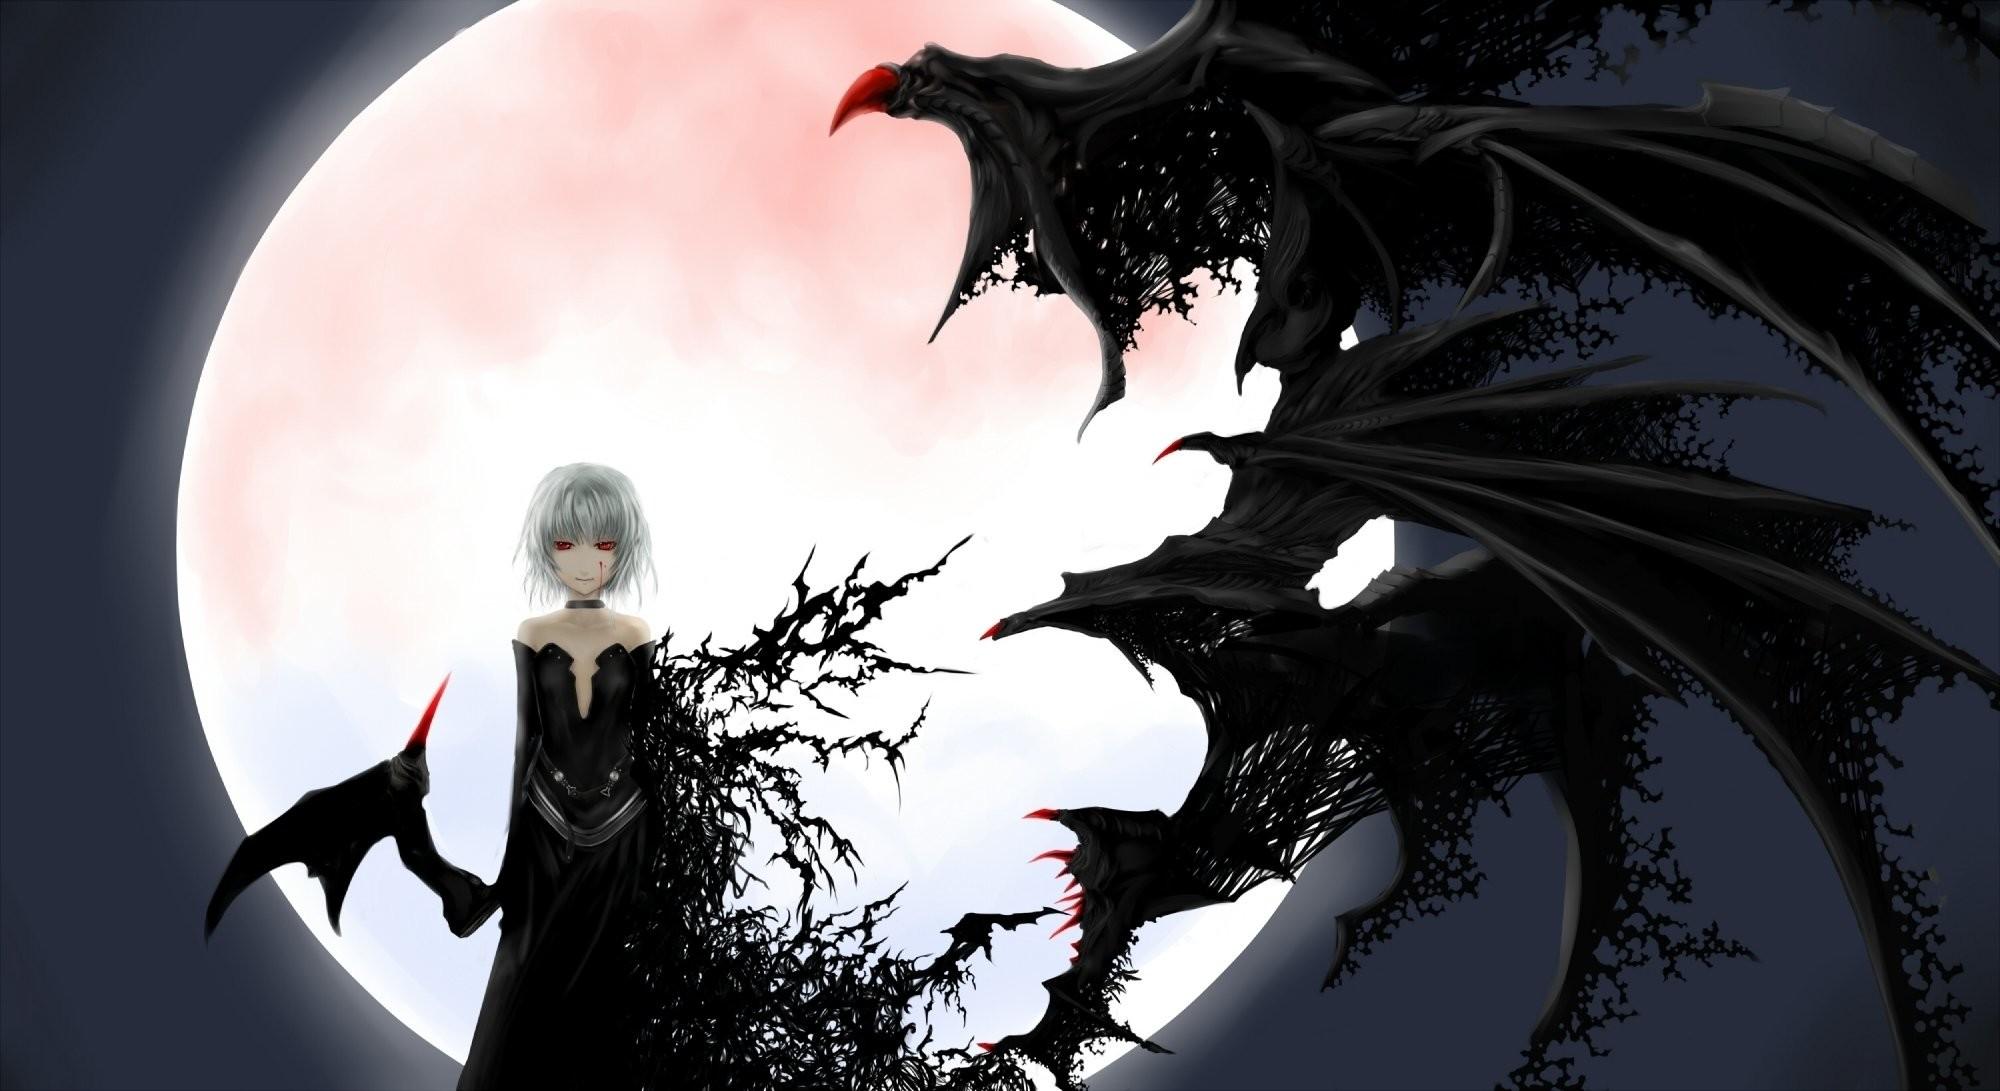 Creepy anime girl albino wings moon background wallpaper | |  787756 | WallpaperUP